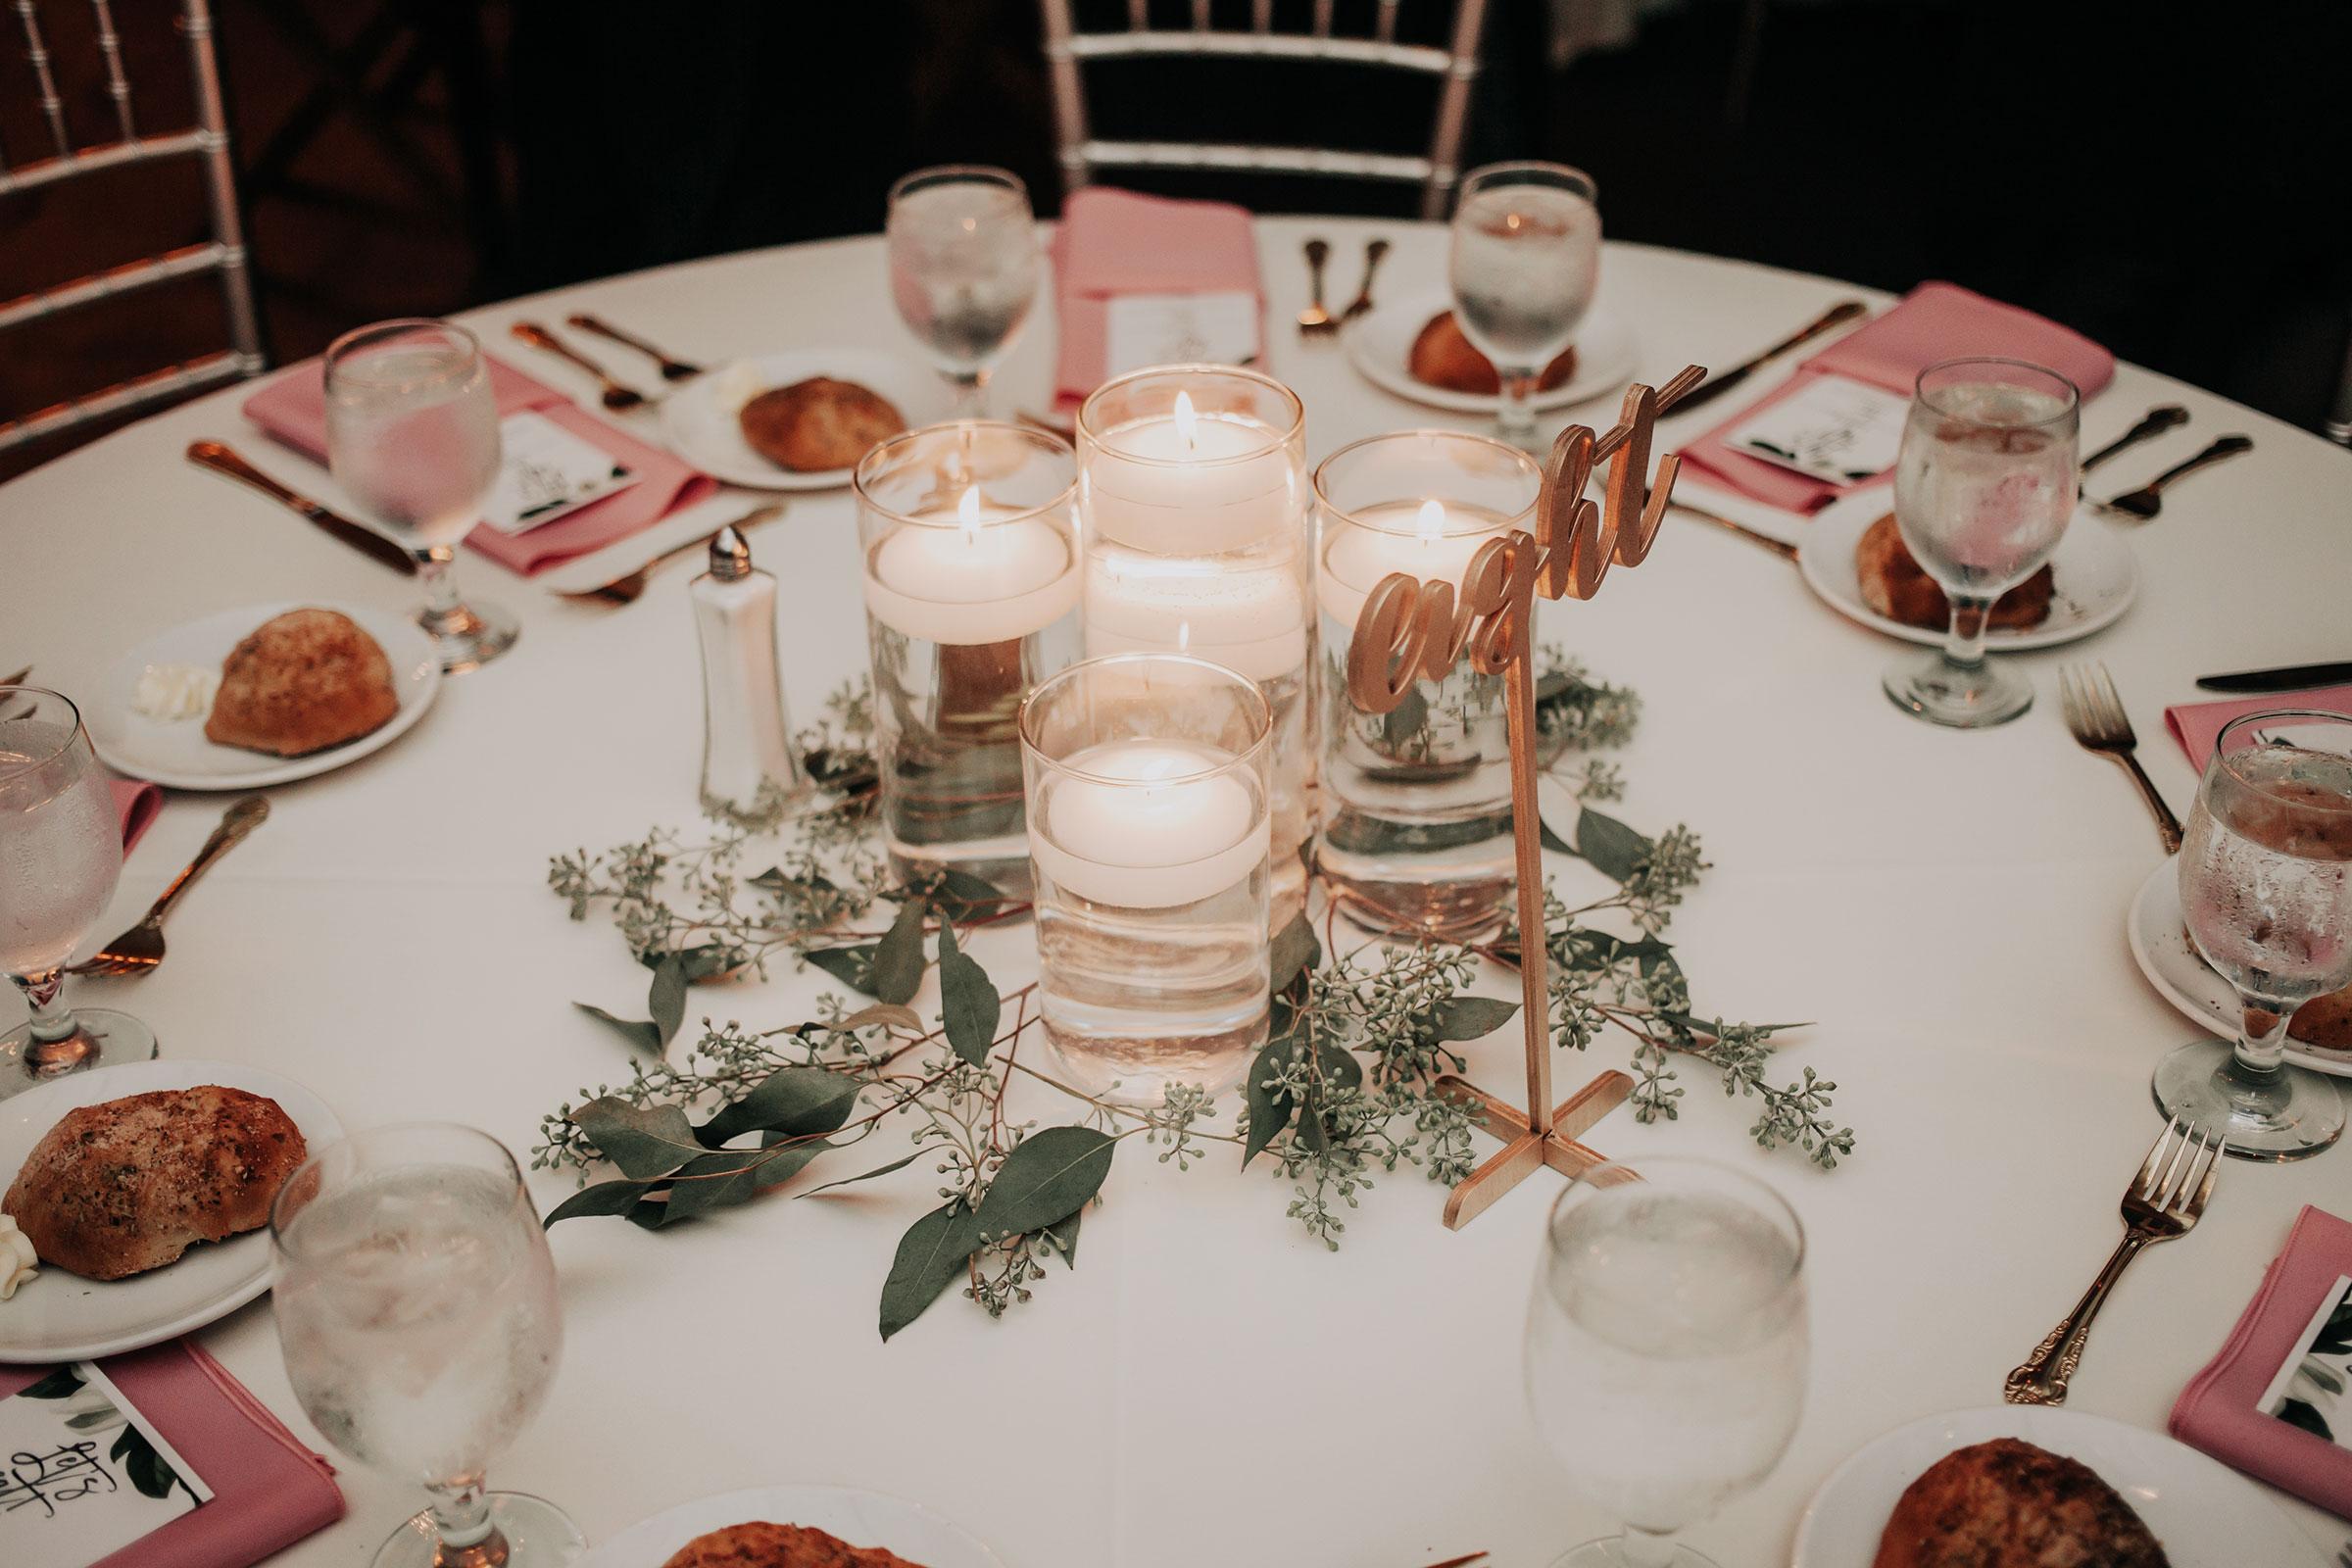 dinner-round-table-details-founders-one-nine-omaha-nebraska-raelyn-ramey-photography.jpg